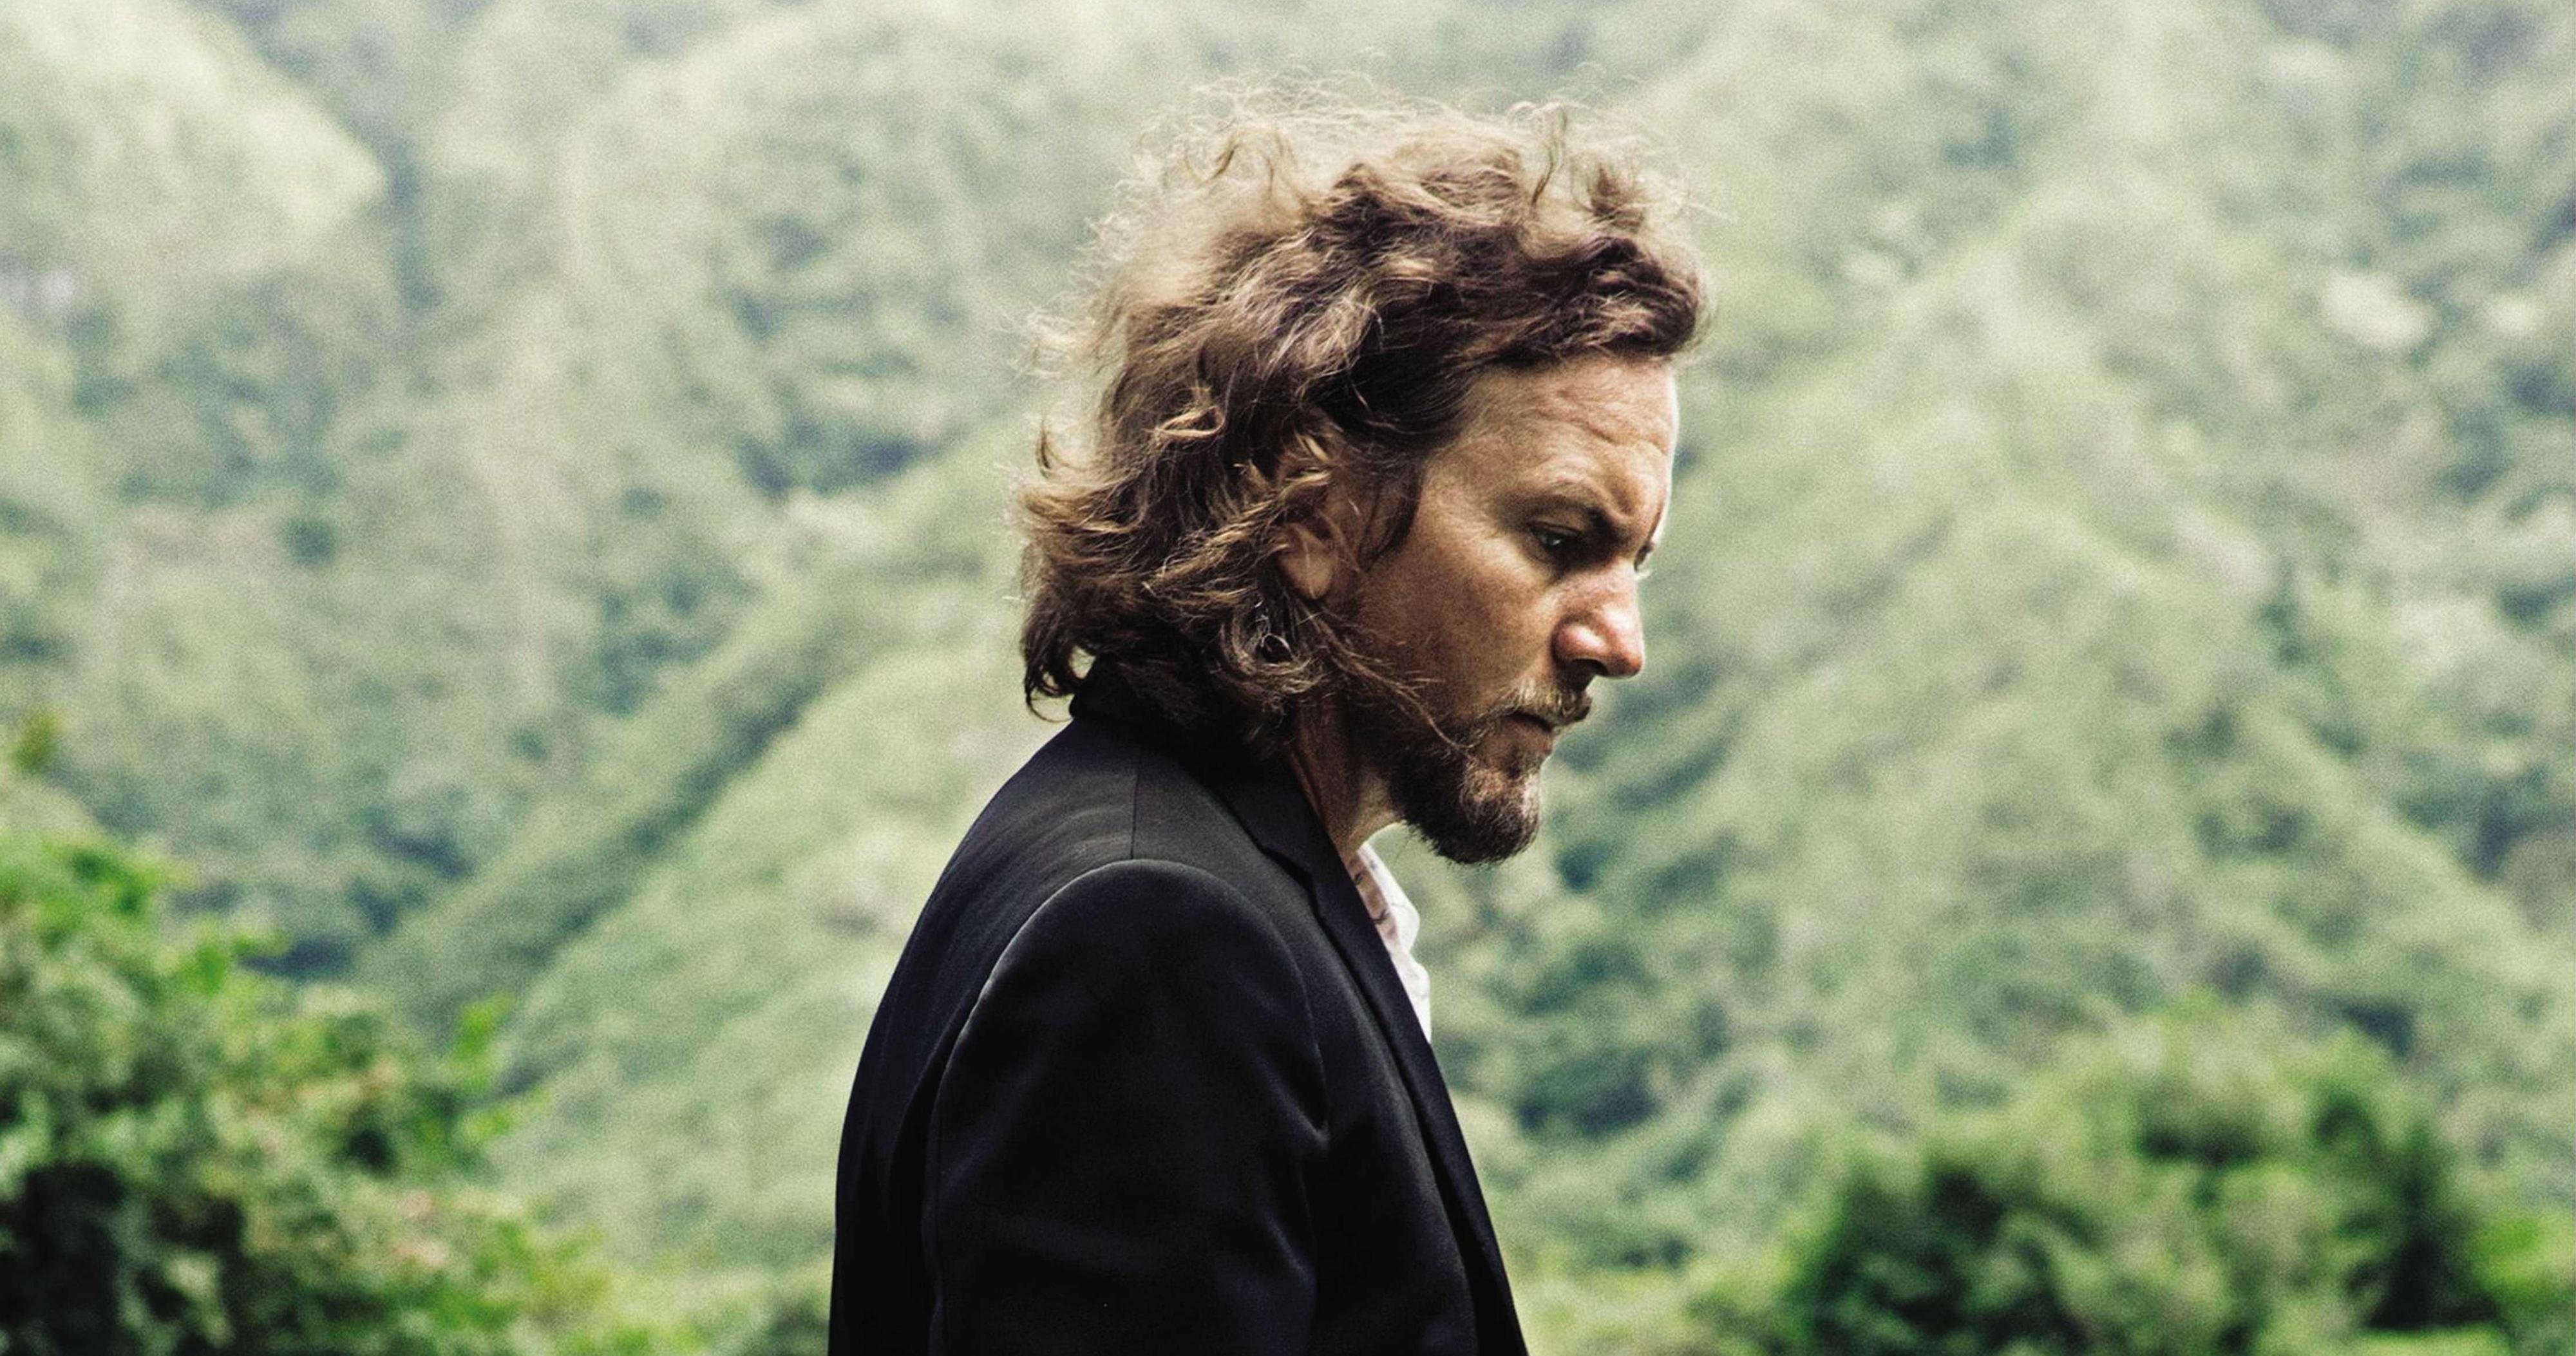 Eddie Vedder Covers Warren Zevon at Letterman's Prize Ceremony